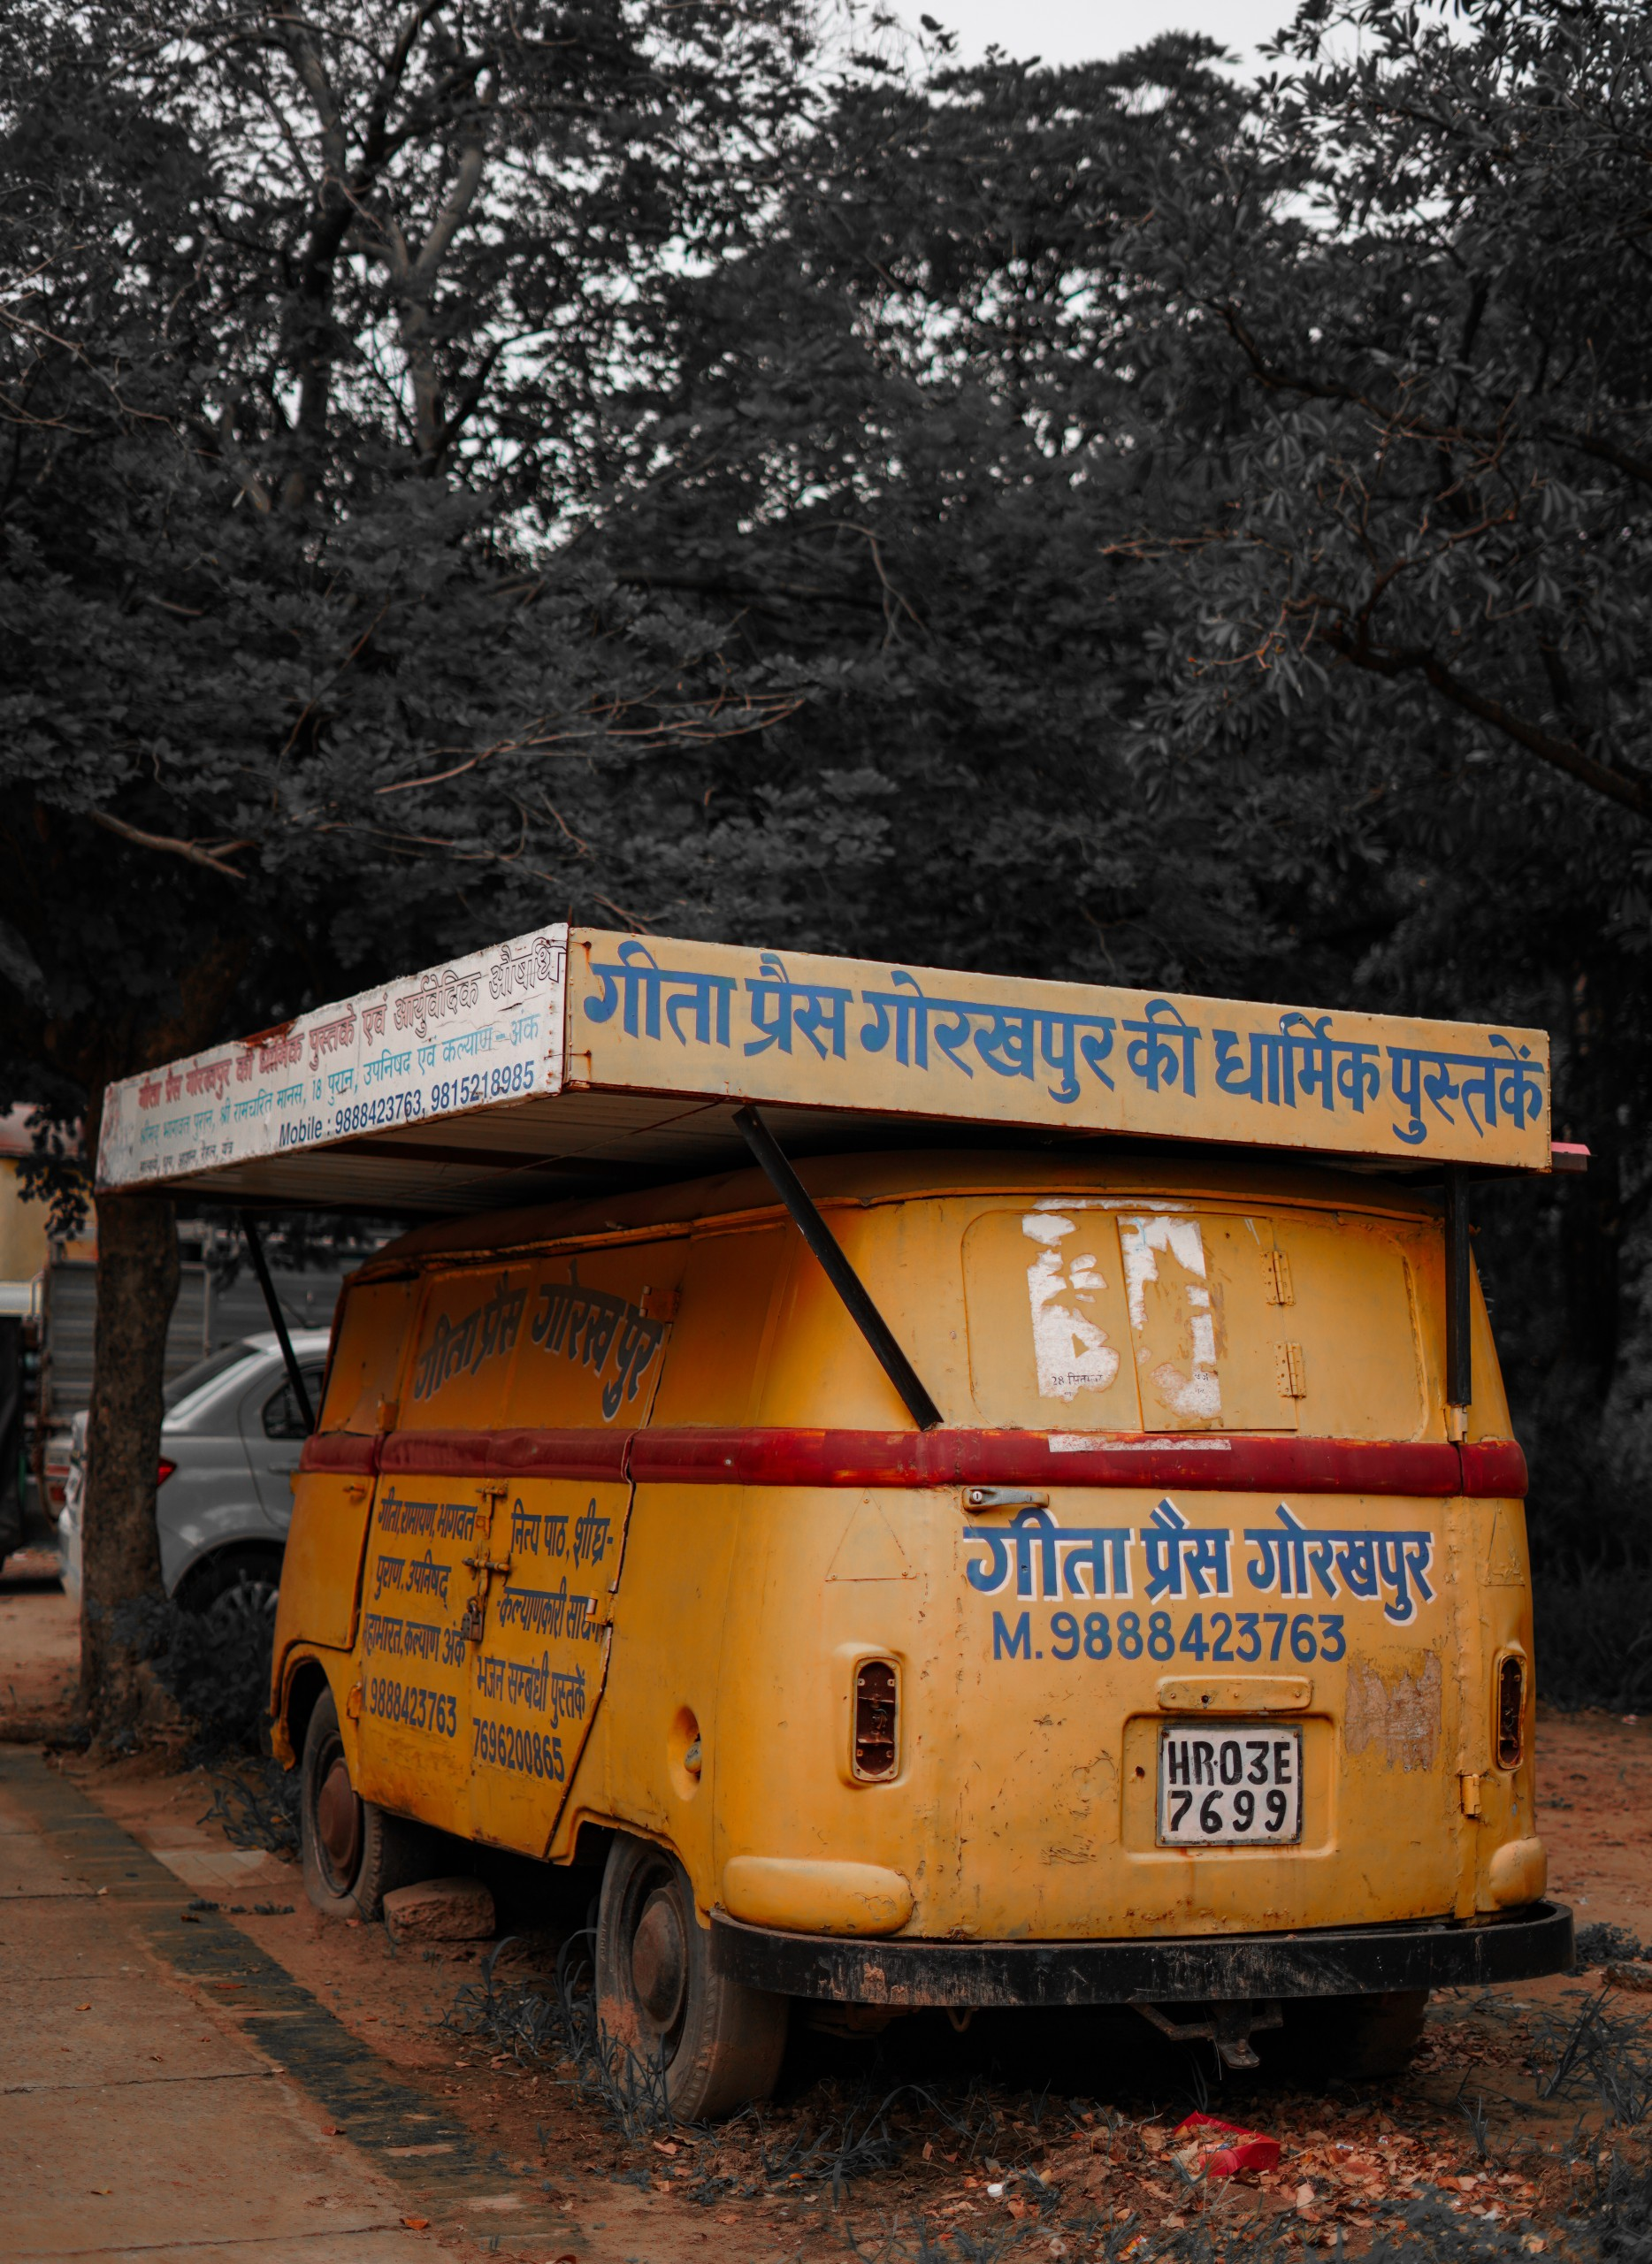 An old van